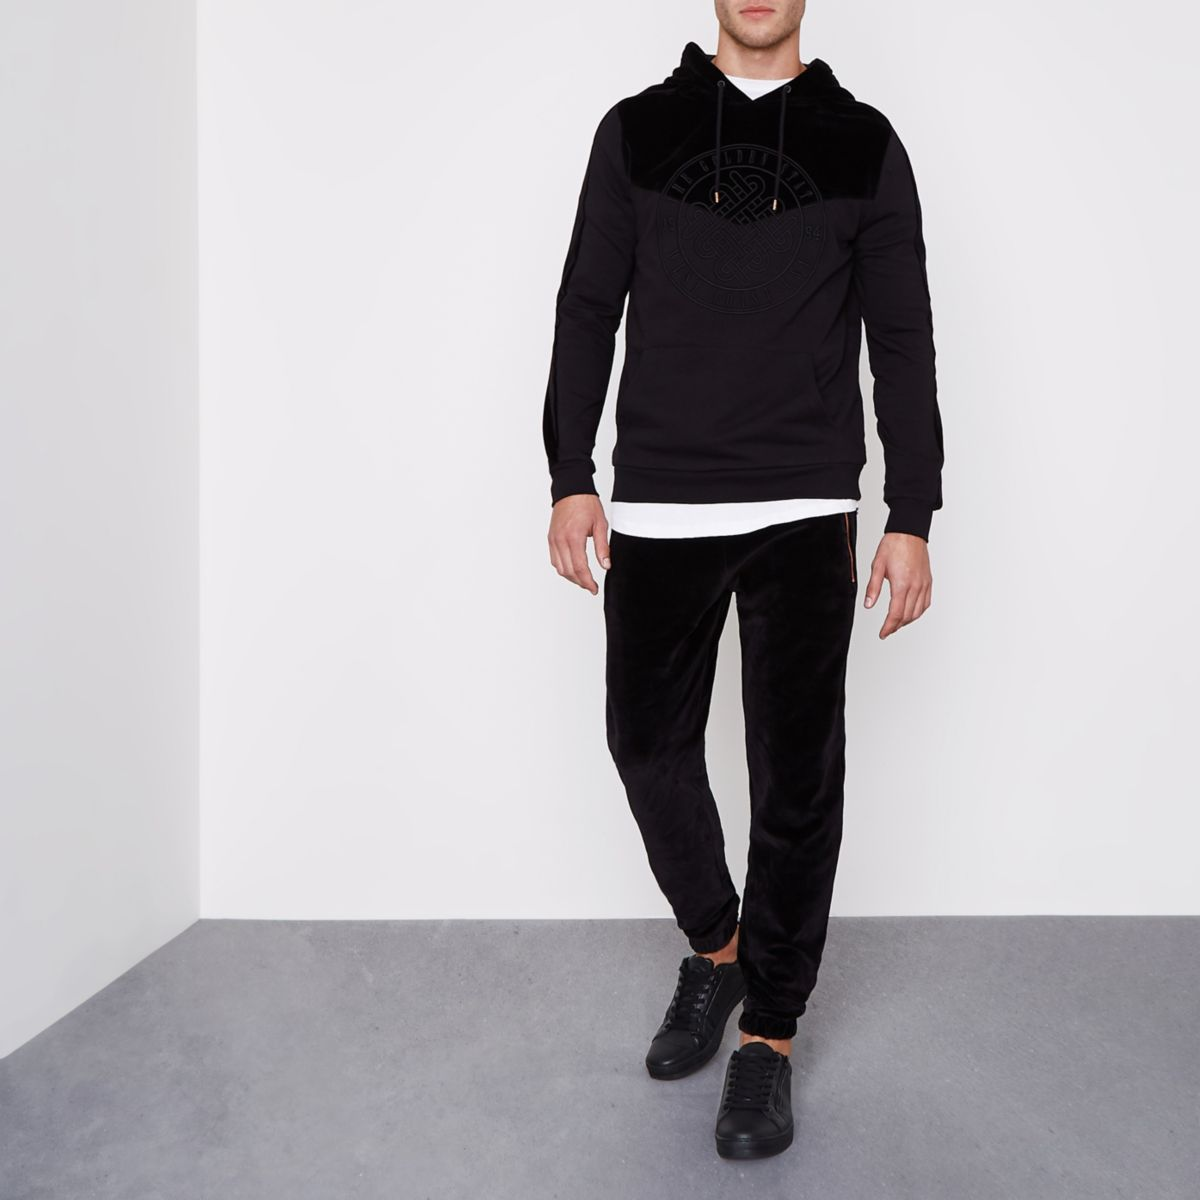 Schwarze Jogginghose aus Samt